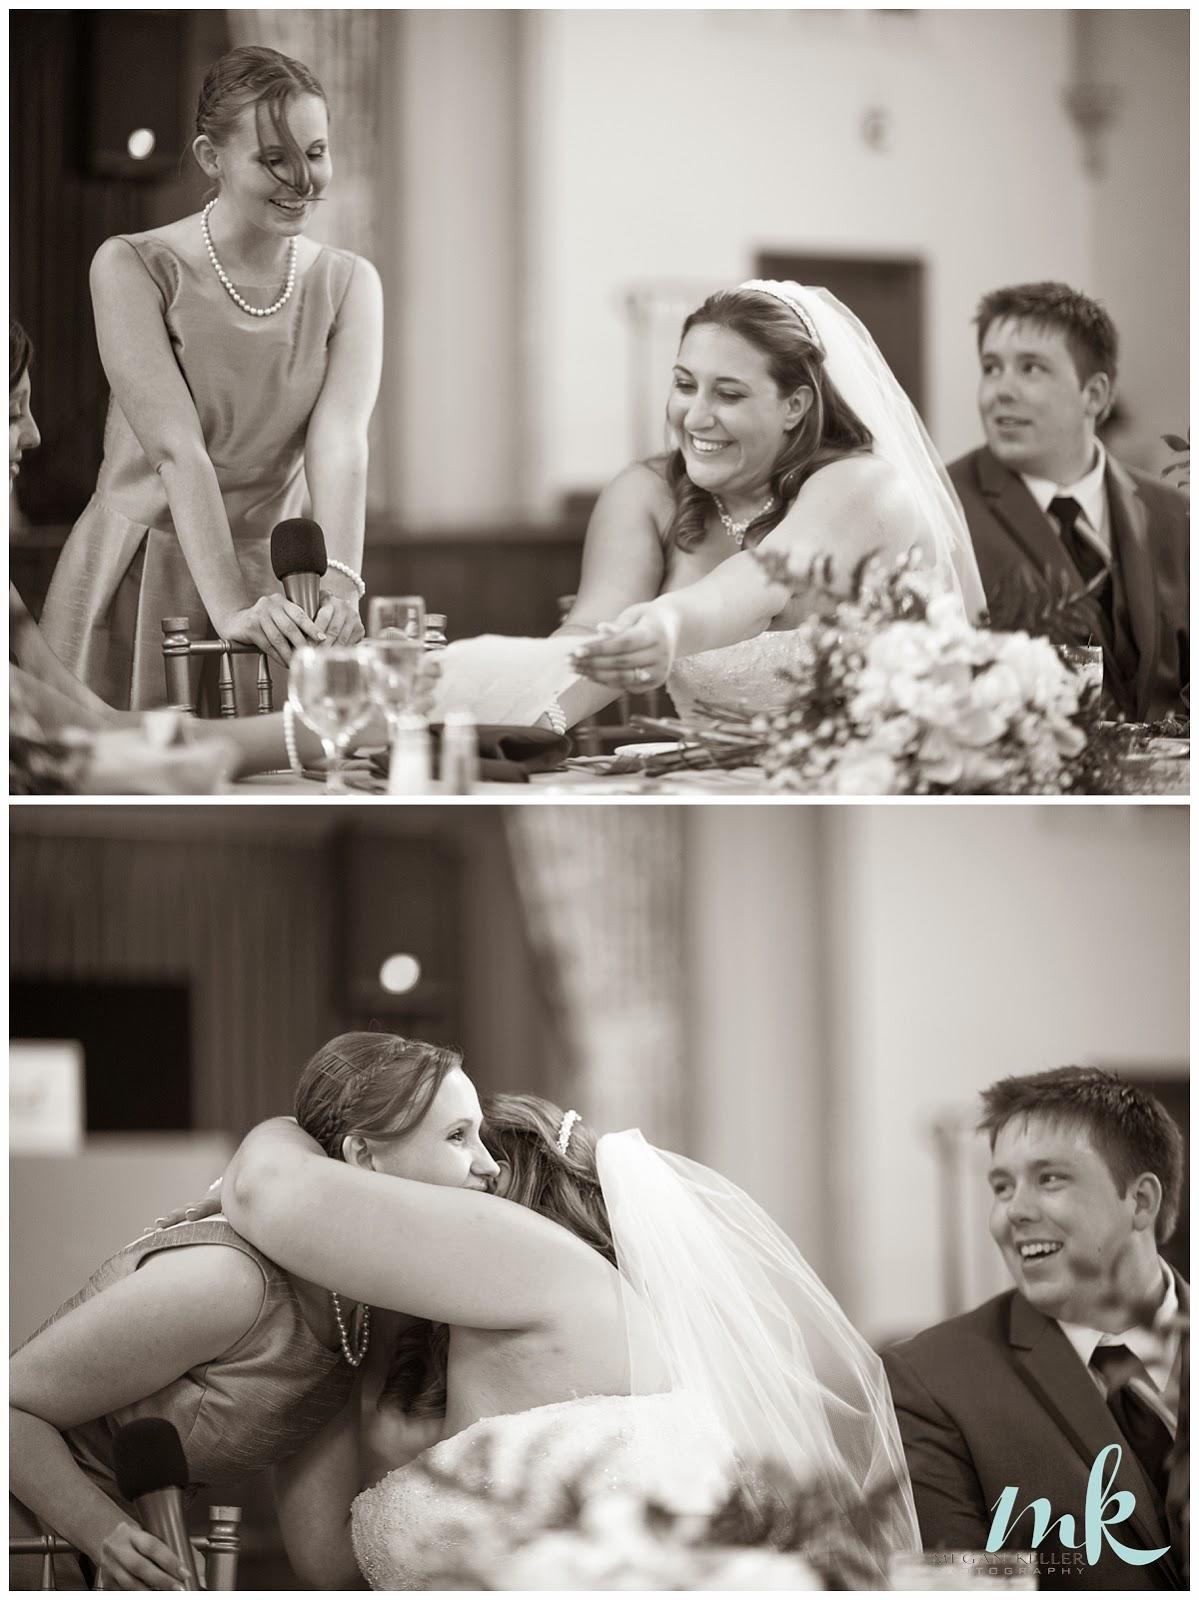 Marissa and Justin's Wedding Marissa and Justin's Wedding 2014 07 30 0015